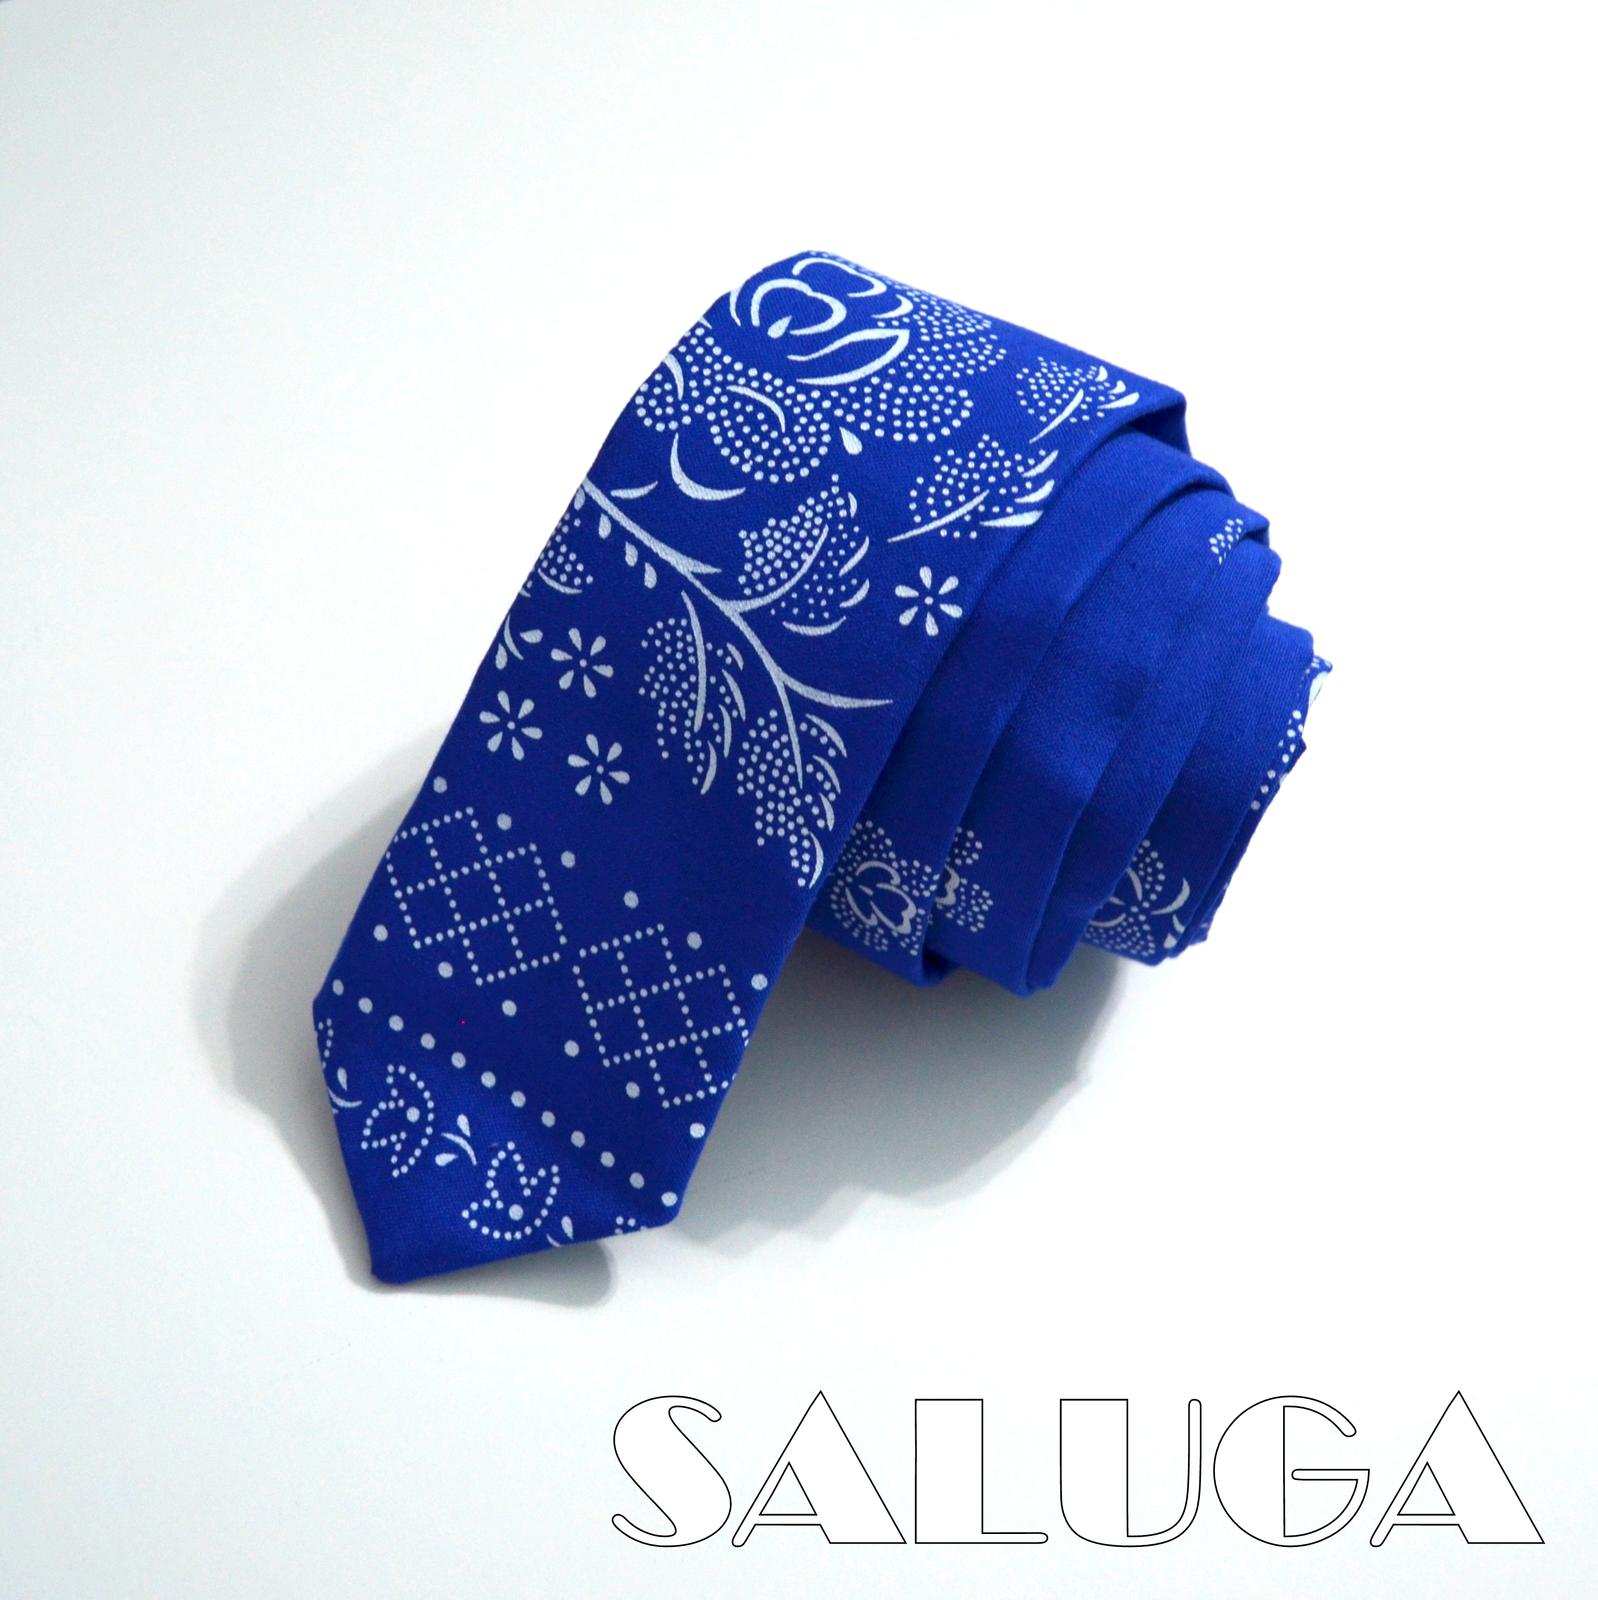 Pánska slim kravata - folklórna - modrá - Obrázok č. 1